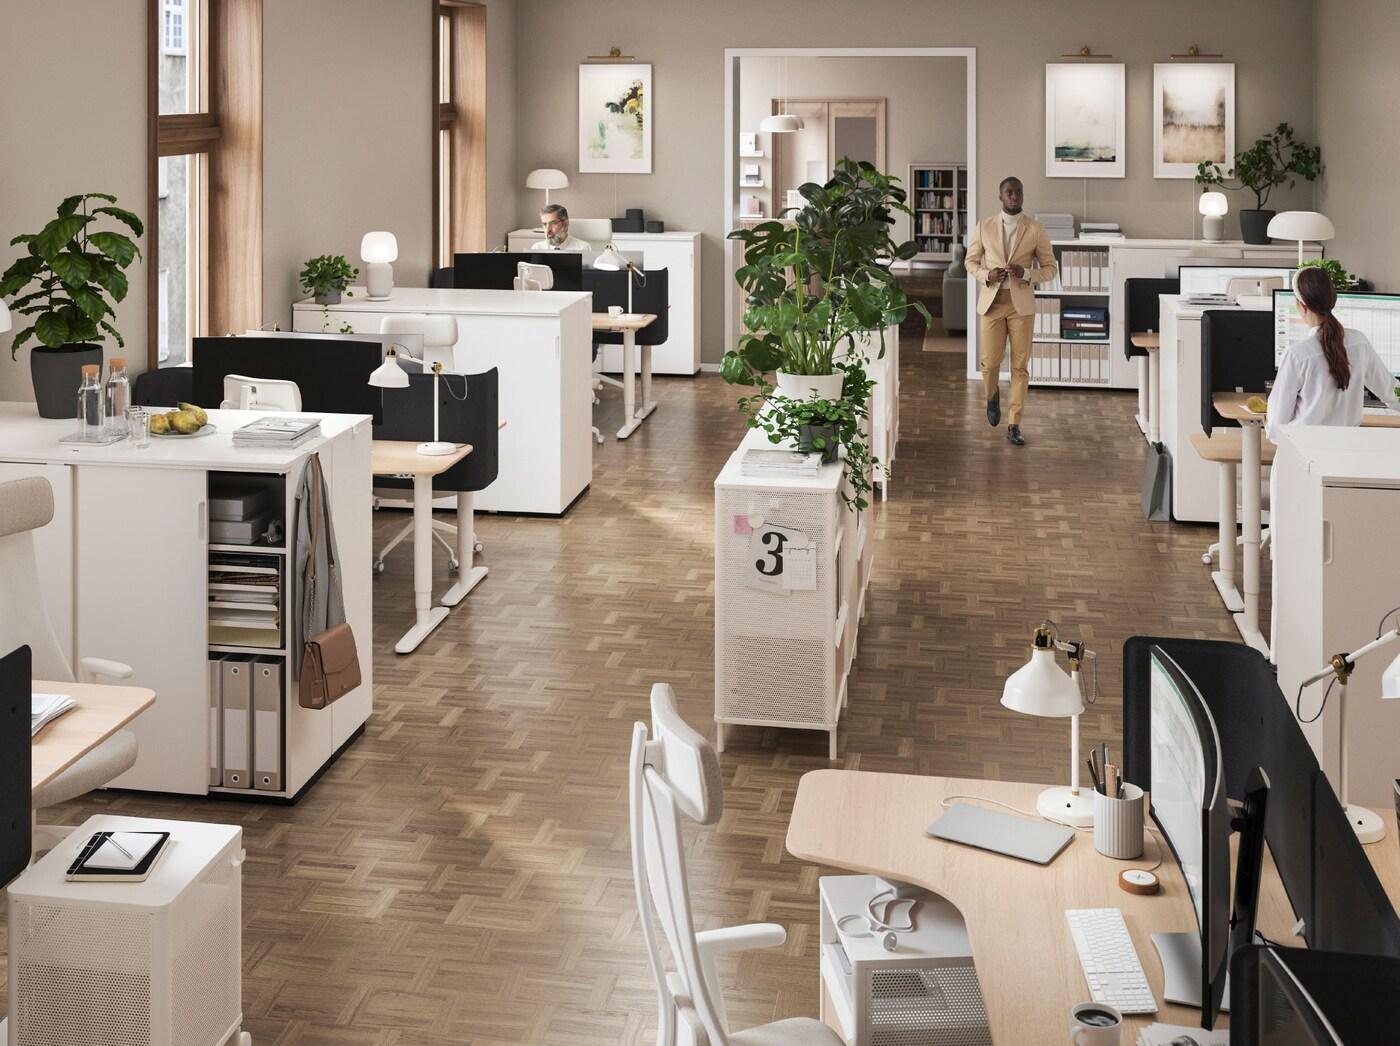 Cavalletti Per Quadri Ikea https://www.ikea/it/it/rooms/kitchen/gallery/adatta-tuo